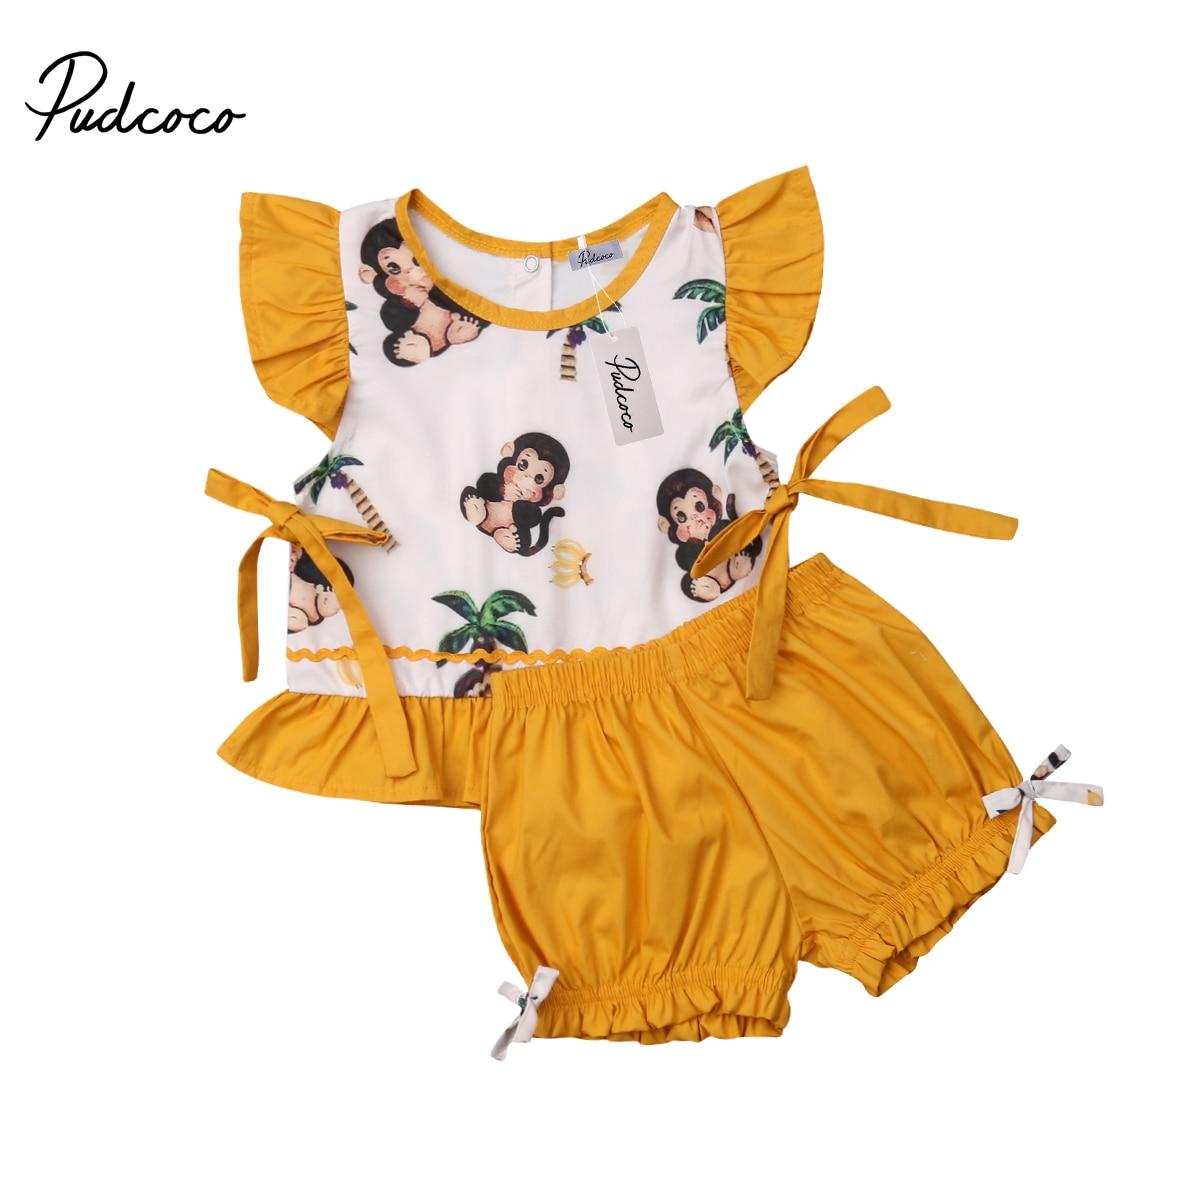 Boys' Clothing 2019 Newborn Infant Toddler Kids Baby Boys Girls Fashion Ruffle Monkey Print Top+shorts Ribbon Design Outfits Clothes 2pcs Reputation First